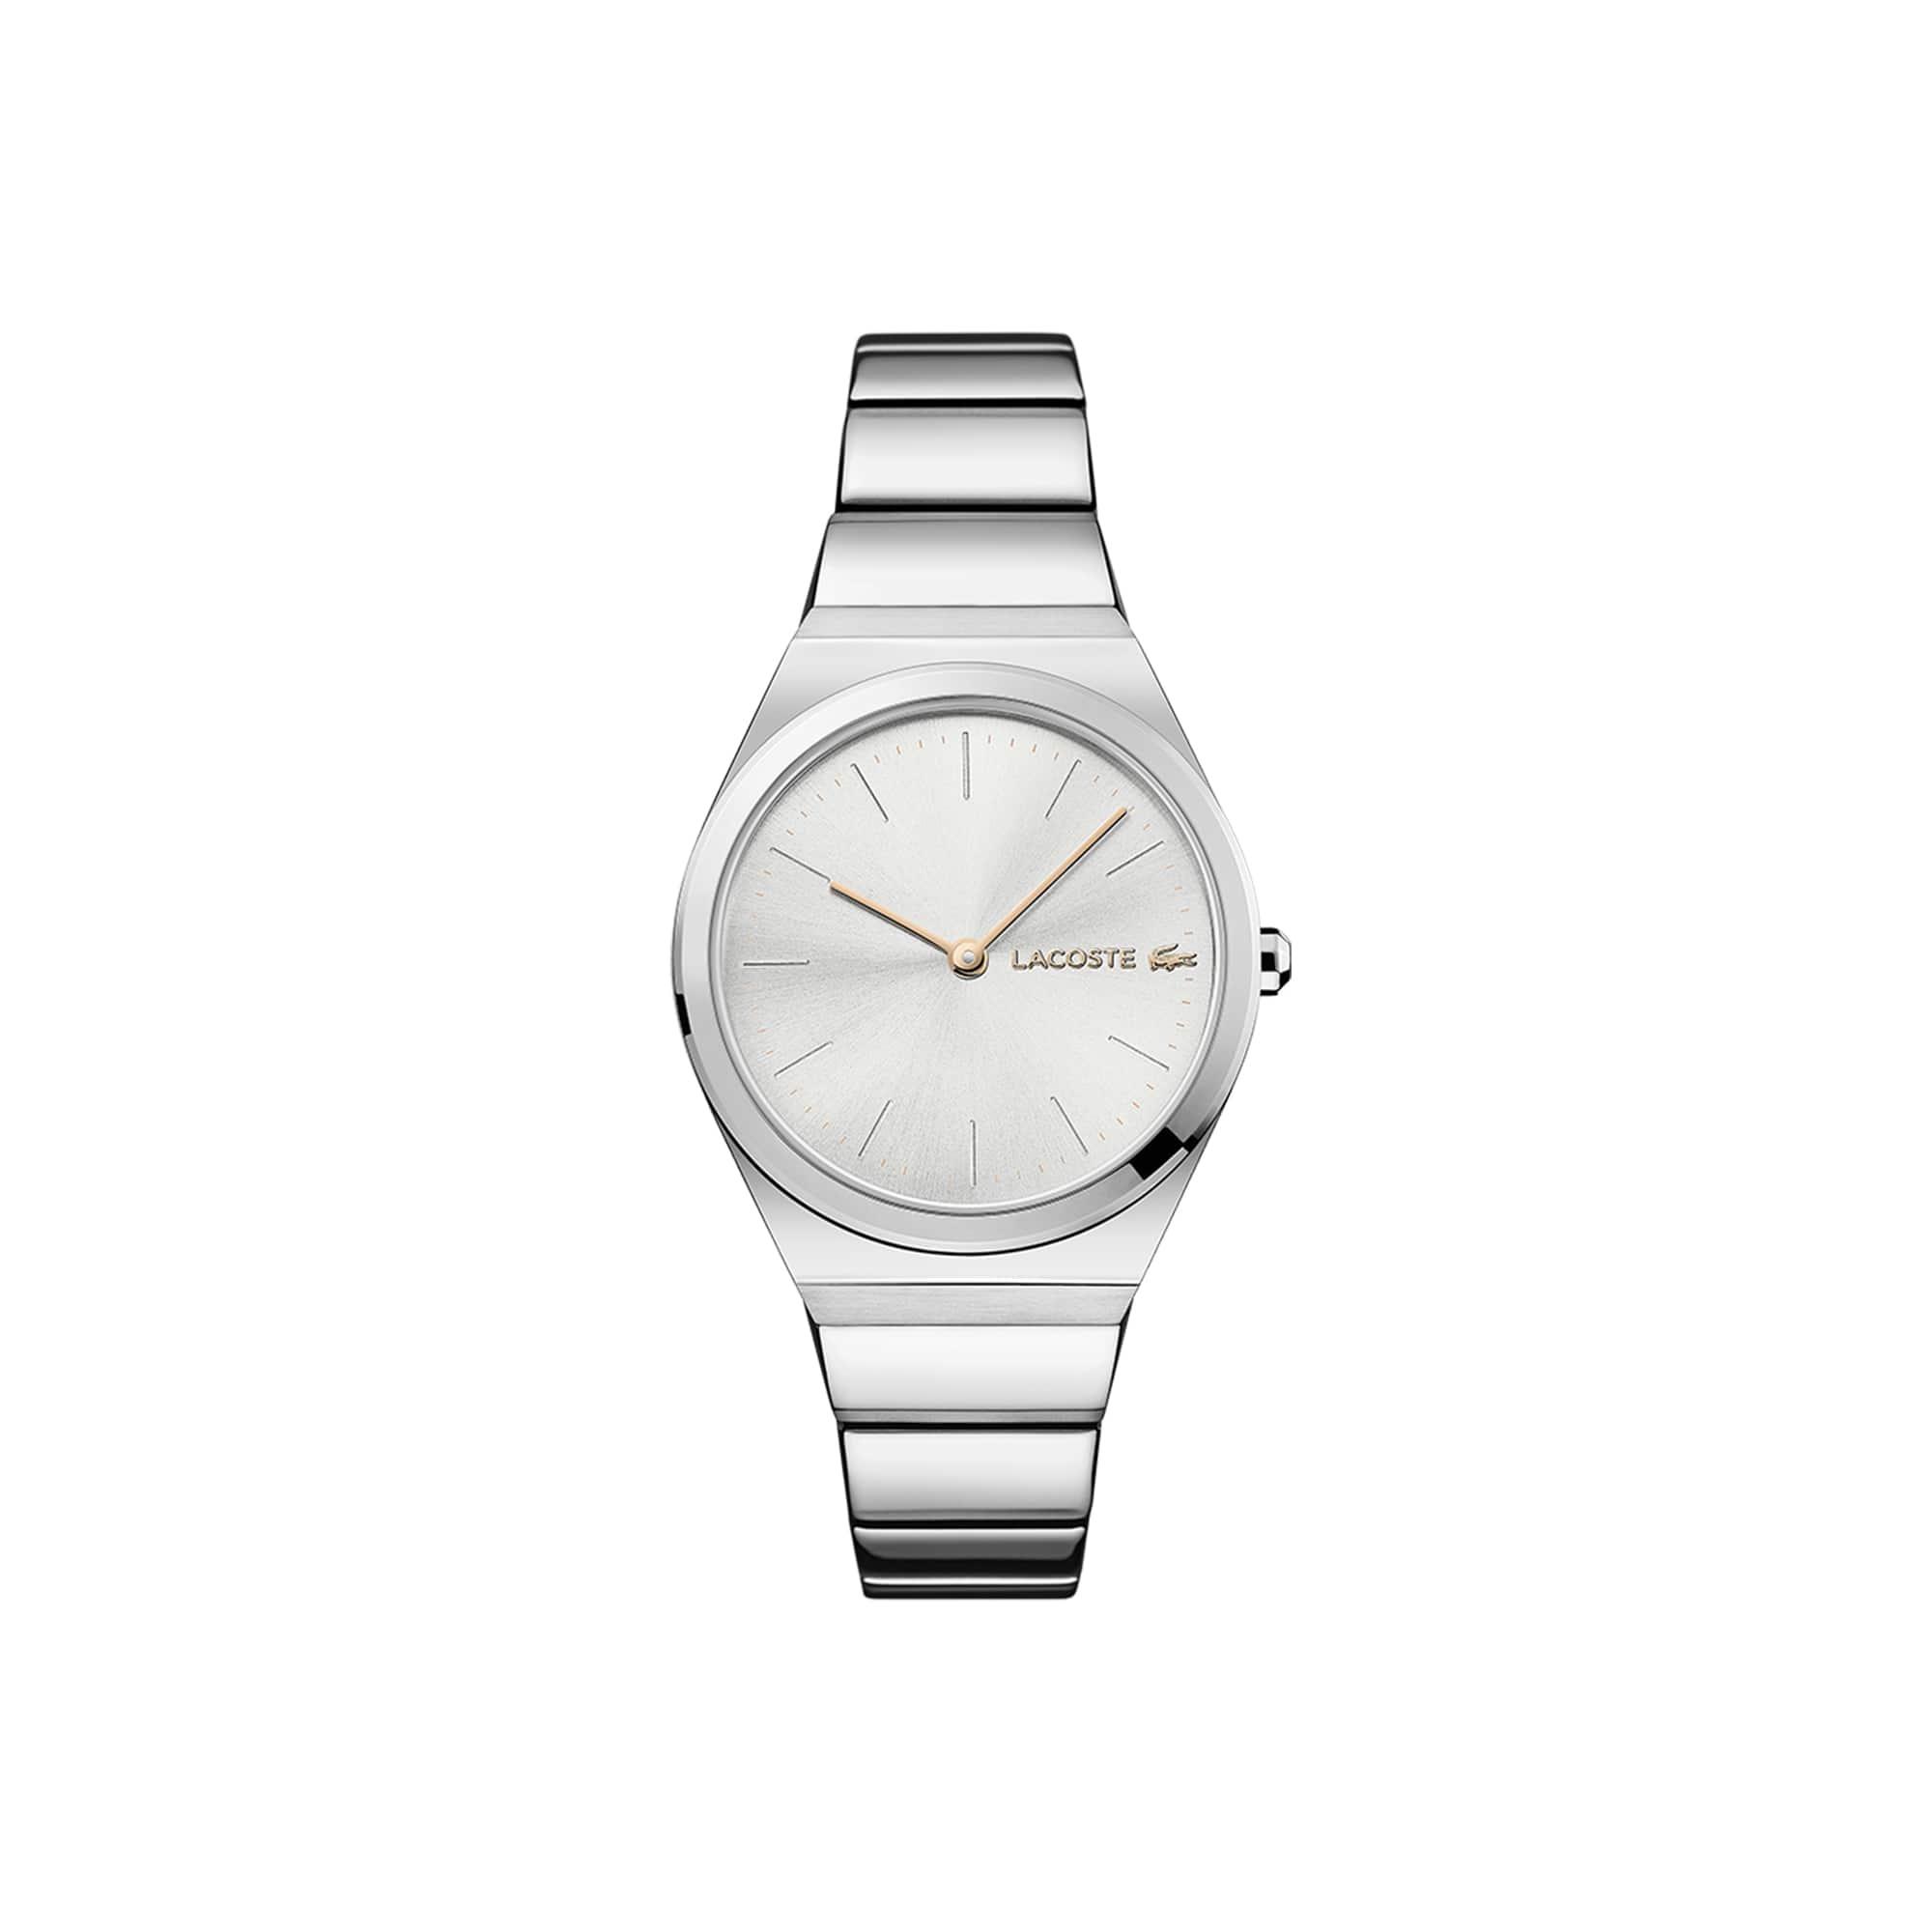 Women's Mia Watch with Stainless Steel Bracelet